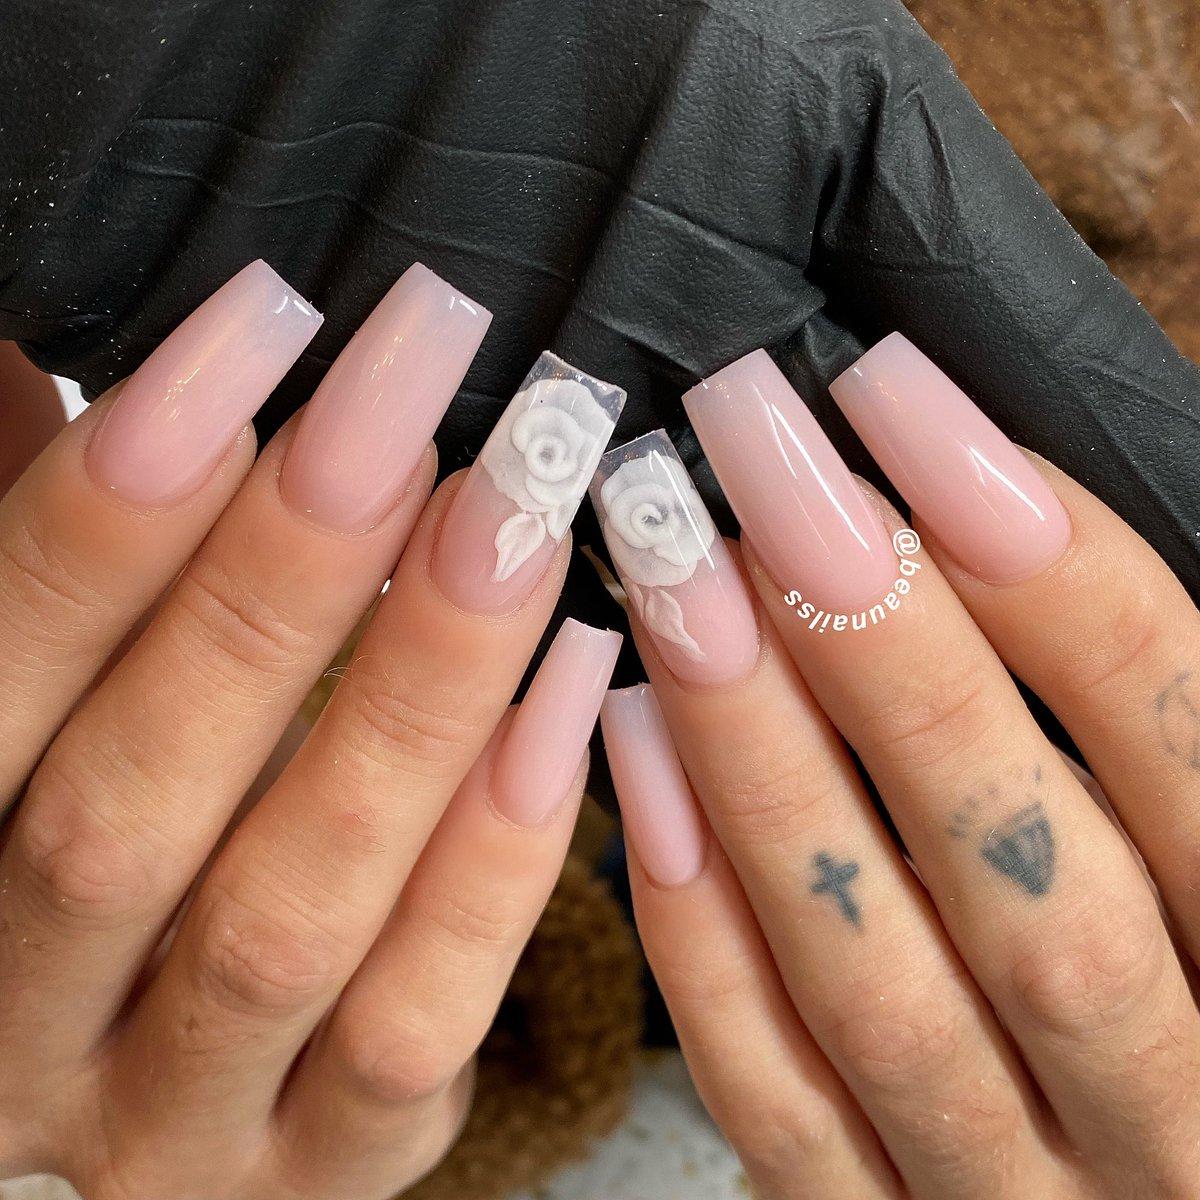 Natural set for Hazel #beaunailss #beautifulnailssheffield #sheffieldnails #nailsinsheffield #sheffield #sheffieldissuper #acrylicnails #nailart #nailstagram #naildesigns #nailsmagazine #nailsonfleek #naillover #naillove #coffinnails #ballerinanails #stilettonailspic.twitter.com/luNiKUxwPy